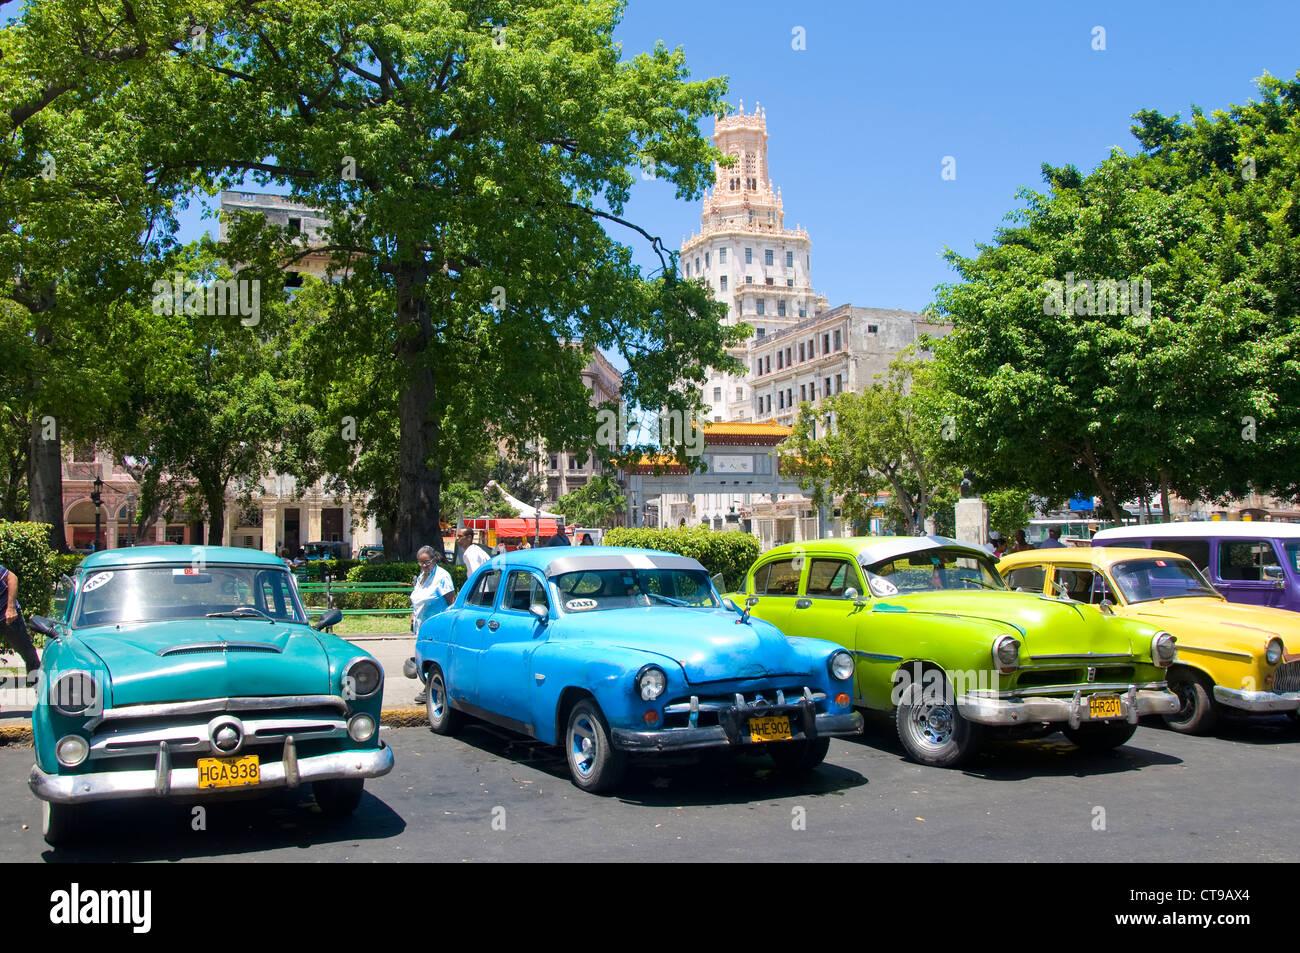 Oldtimer, Parque Central, La Havanna, Kuba Stockbild